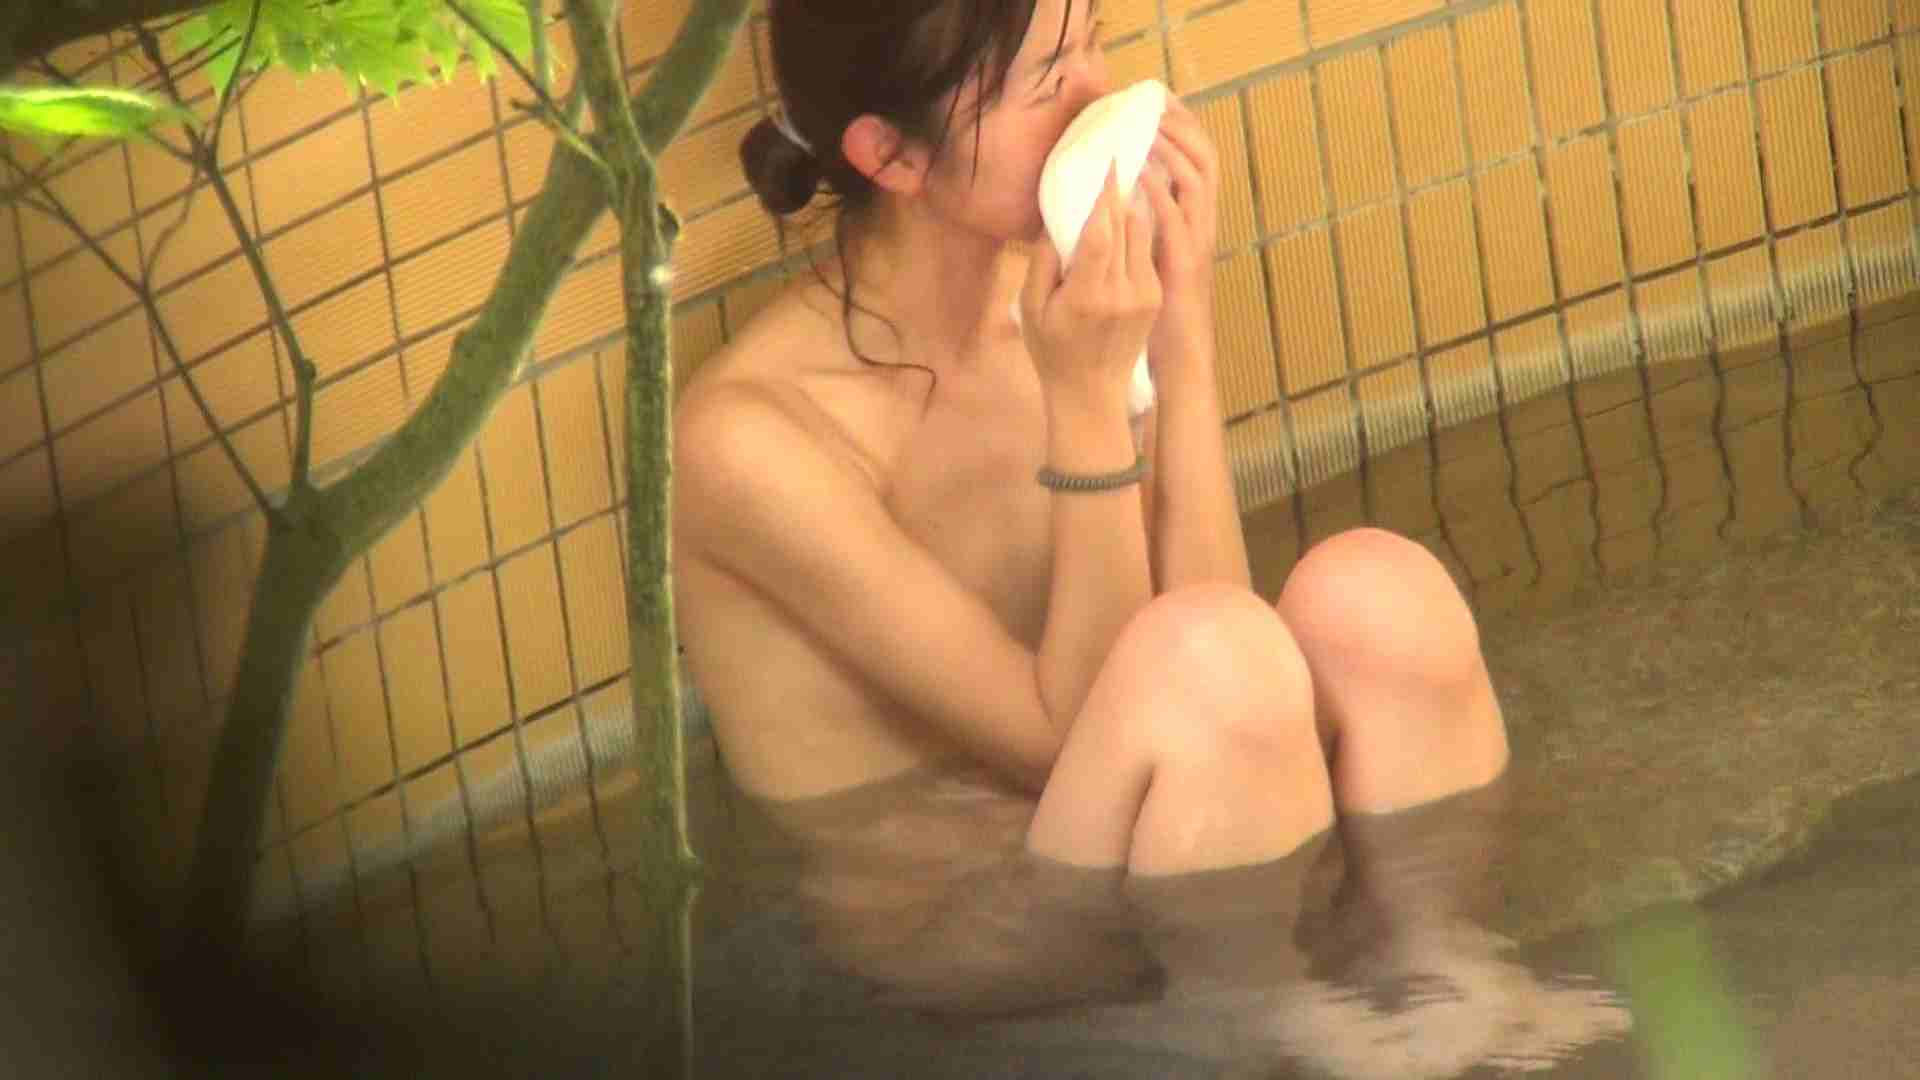 Vol.77 お上品な貧乳色白お女市さまの裸を見る醍醐味 露天入浴 AV無料 107枚 91